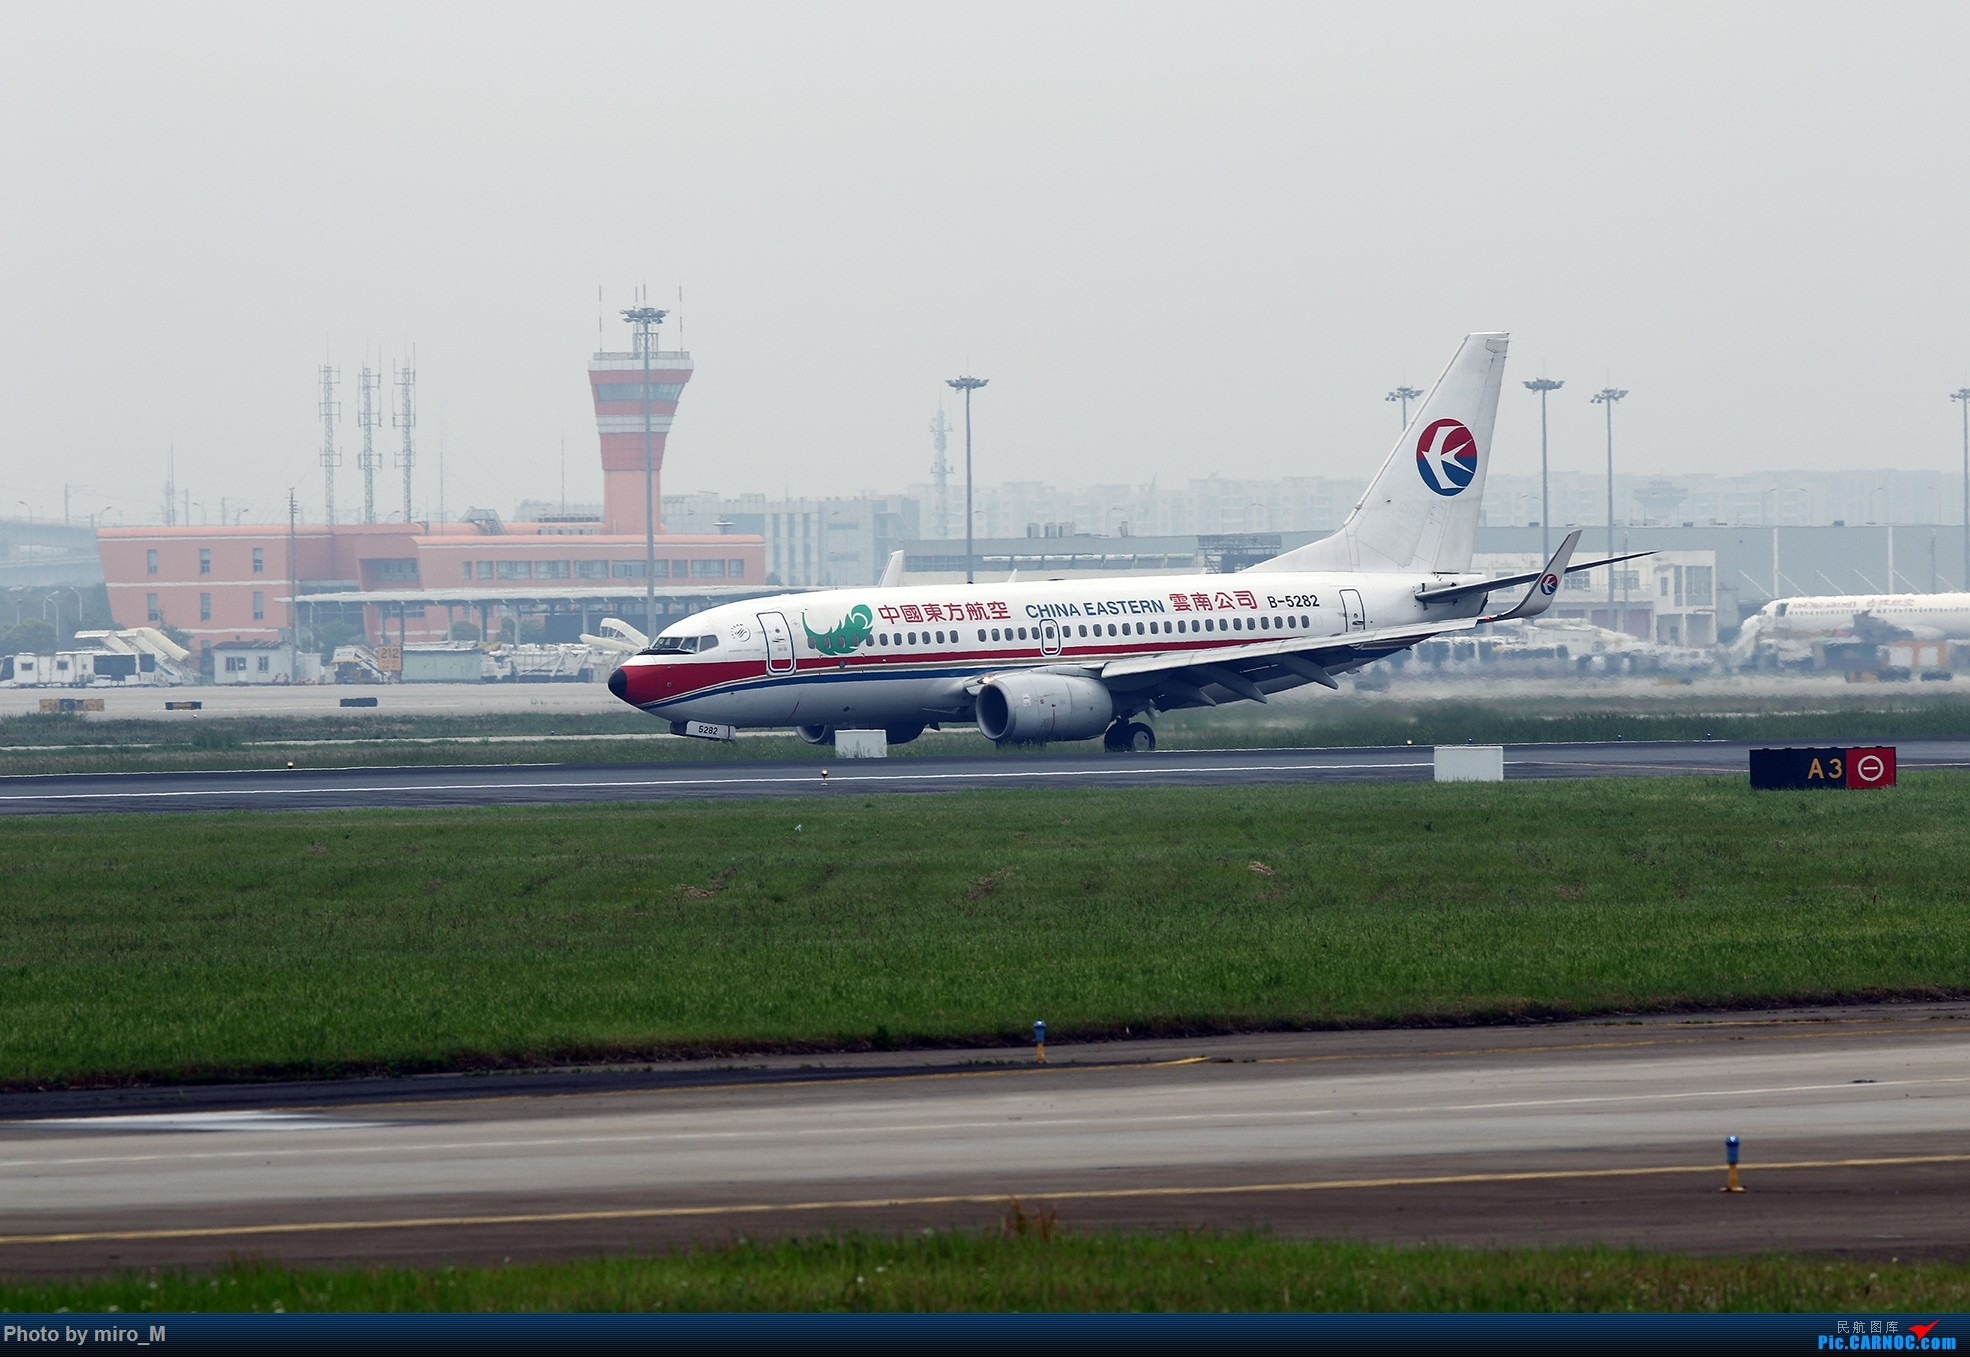 Re:[原创]烂天普通货………………虹桥412-414拍机合集 BOEING 737-700 B-5282 中国上海虹桥国际机场